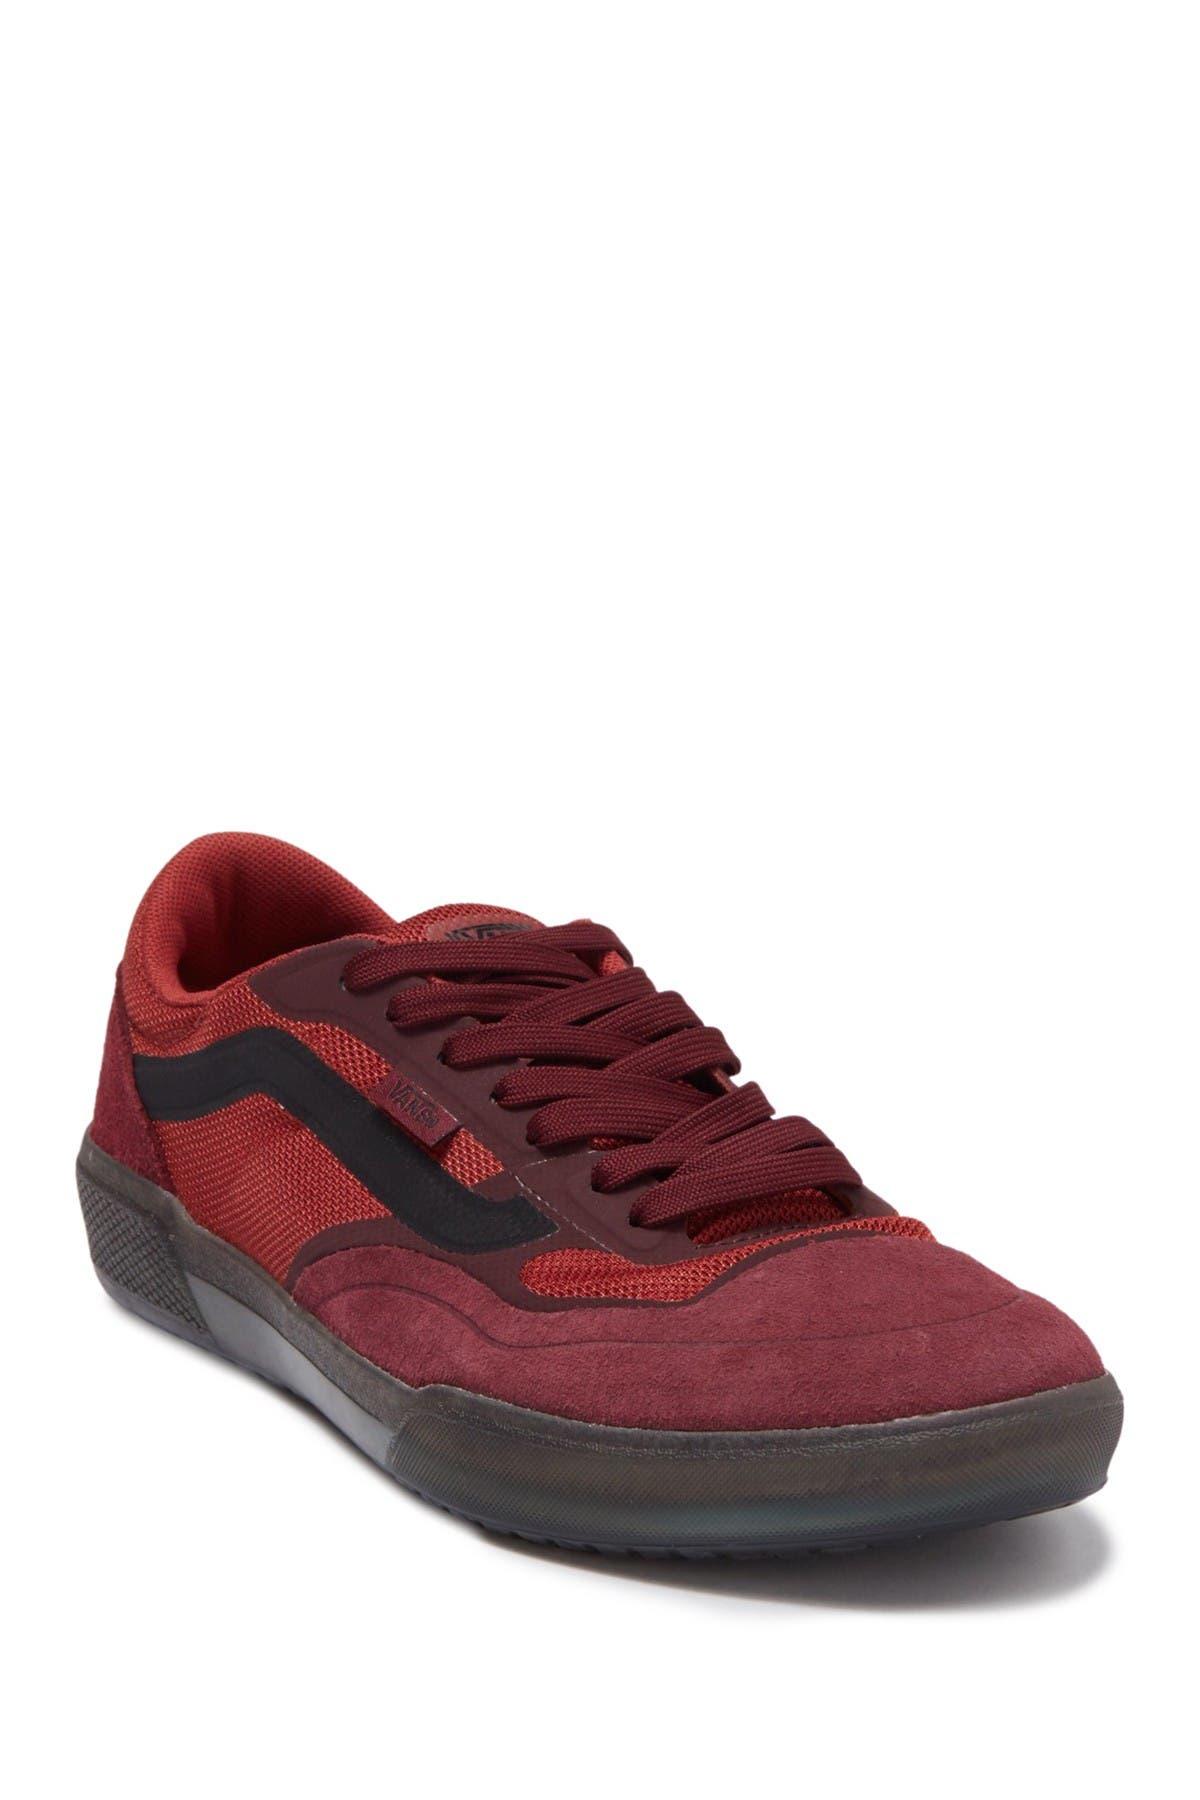 VANS | Ave Pro Sneaker | Nordstrom Rack